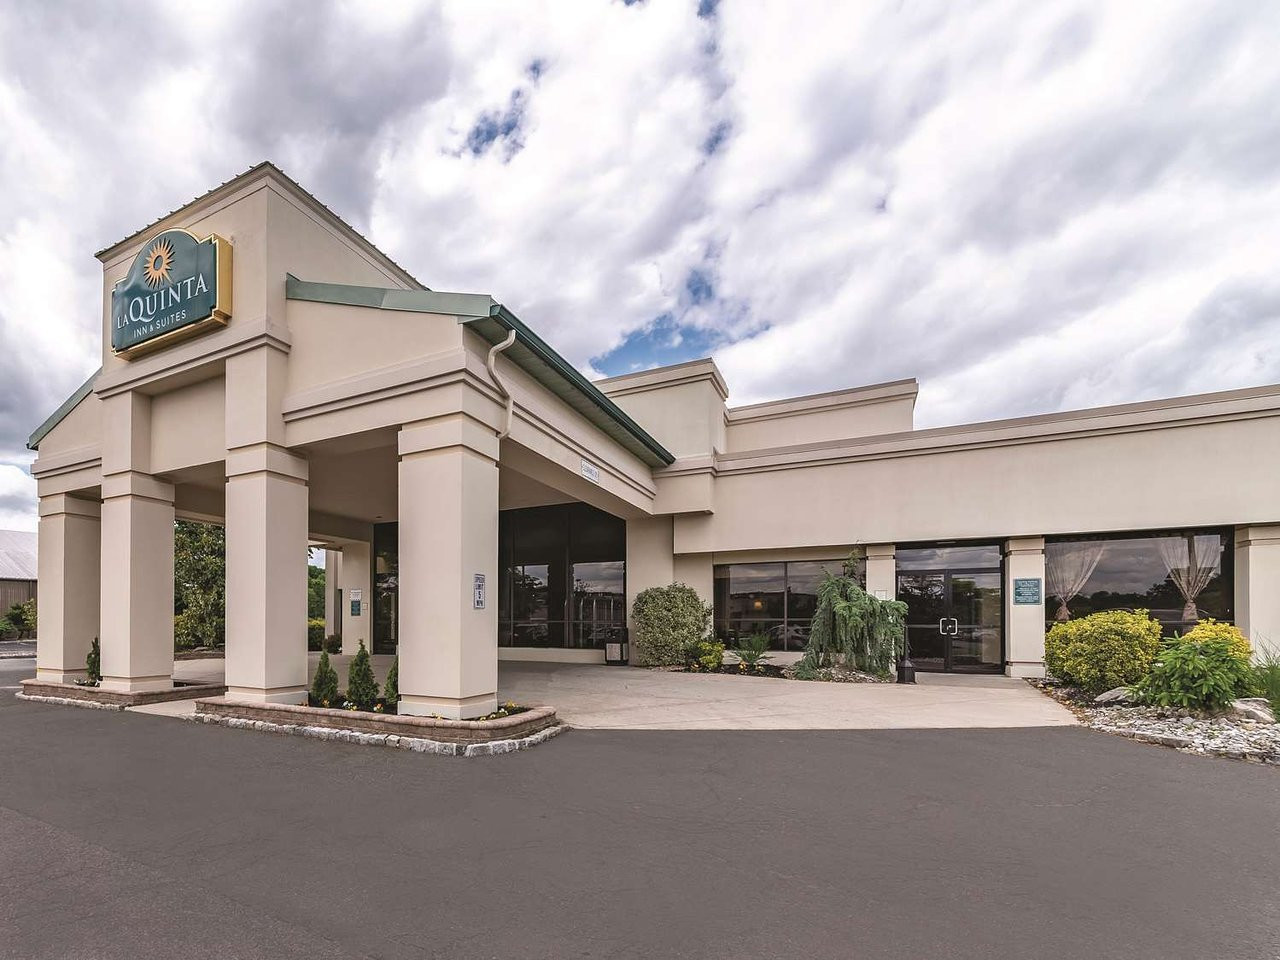 Pc Hardwood Floors Newark Nj Of La Quinta Inn Suites Fairfield Updated 2018 Prices Hotel Intended for La Quinta Inn Suites Fairfield Updated 2018 Prices Hotel Reviews Nj Tripadvisor